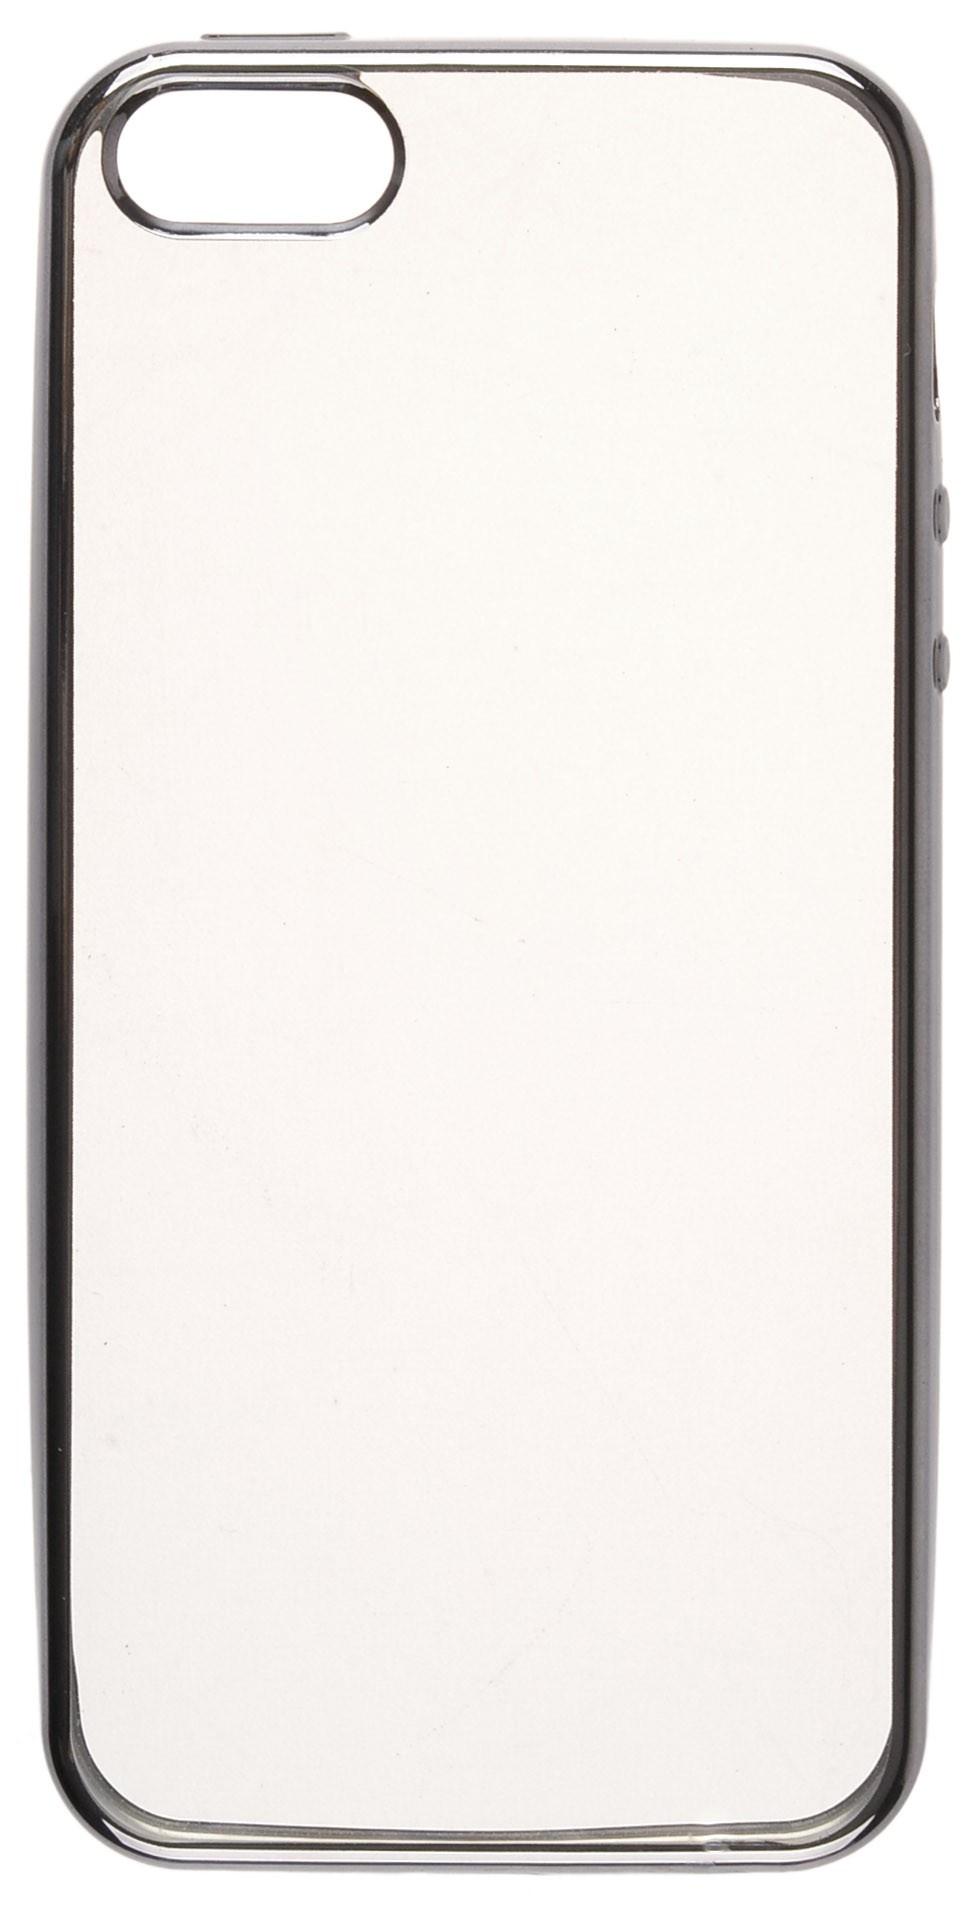 все цены на Чехол для сотового телефона skinBOX Silicone chrome border, 4660041407648, черный онлайн